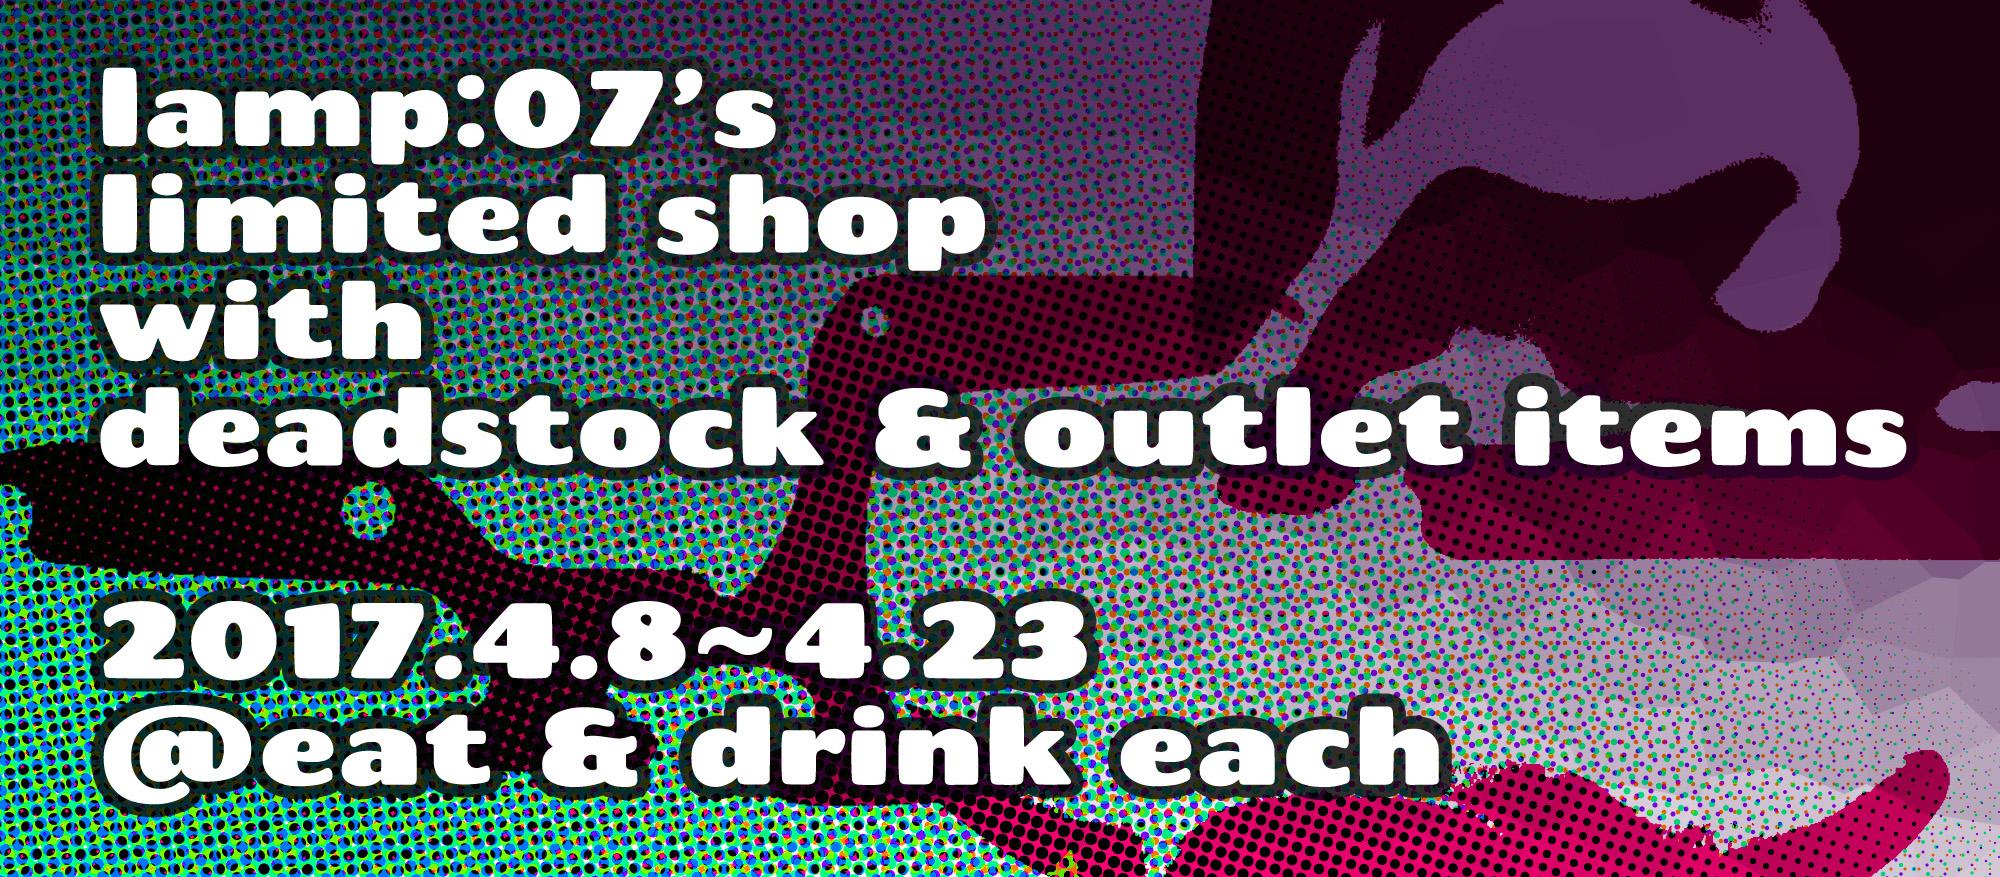 limited shop @ eat & drink each